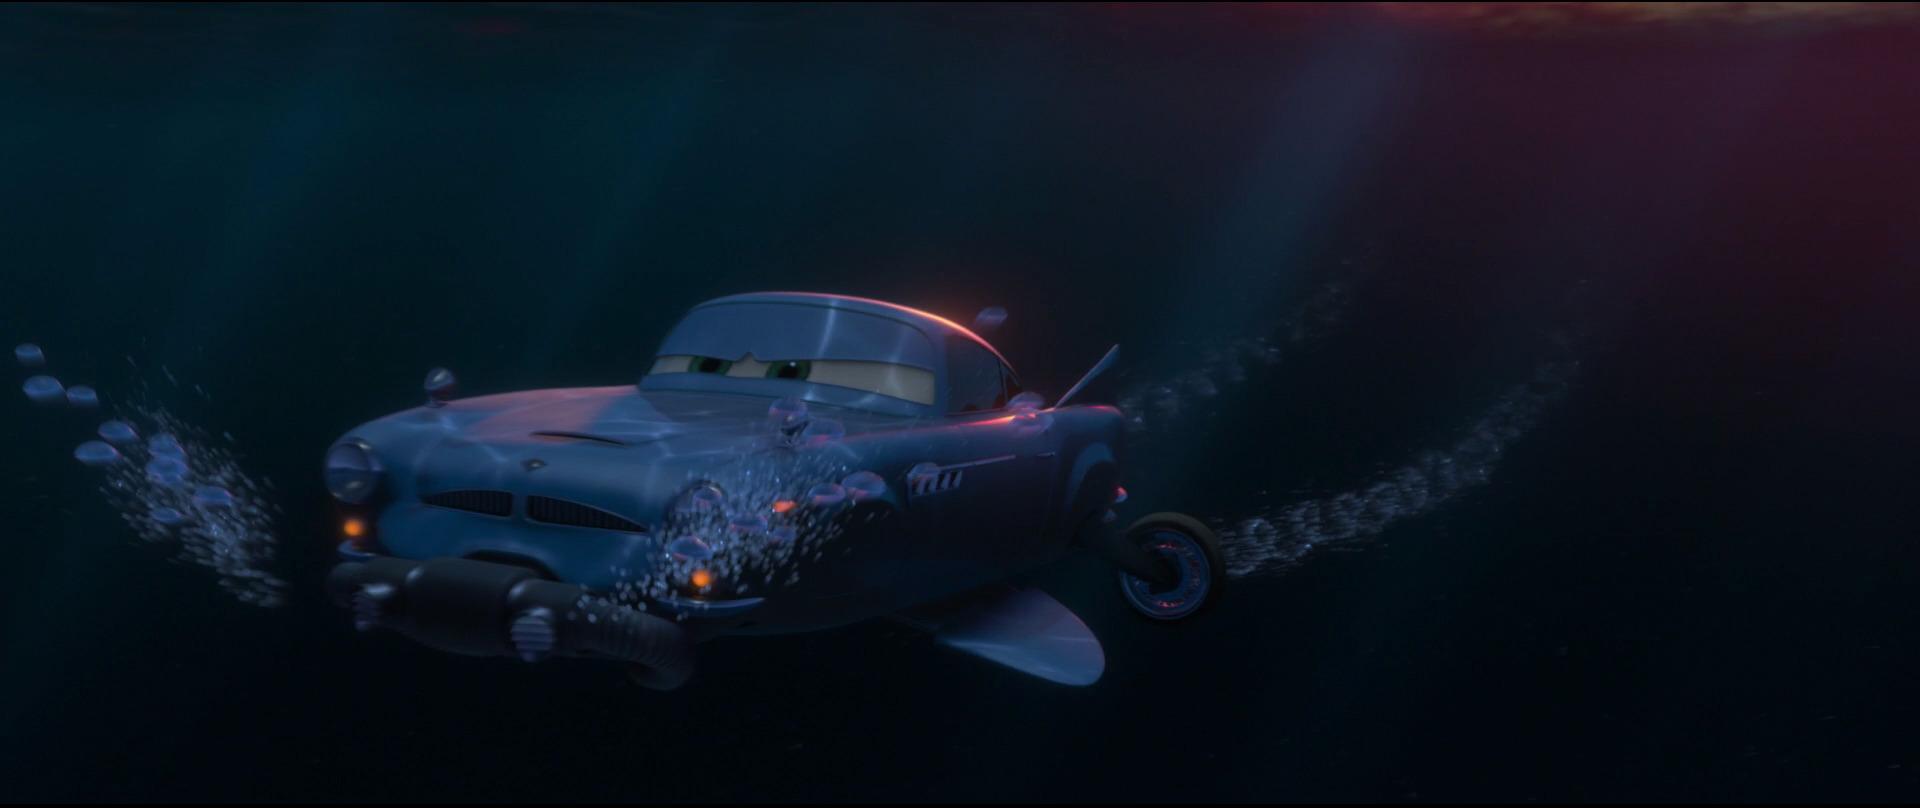 Disney Cars 2 Secret Agents Amp Lemons Bed And Breakfast